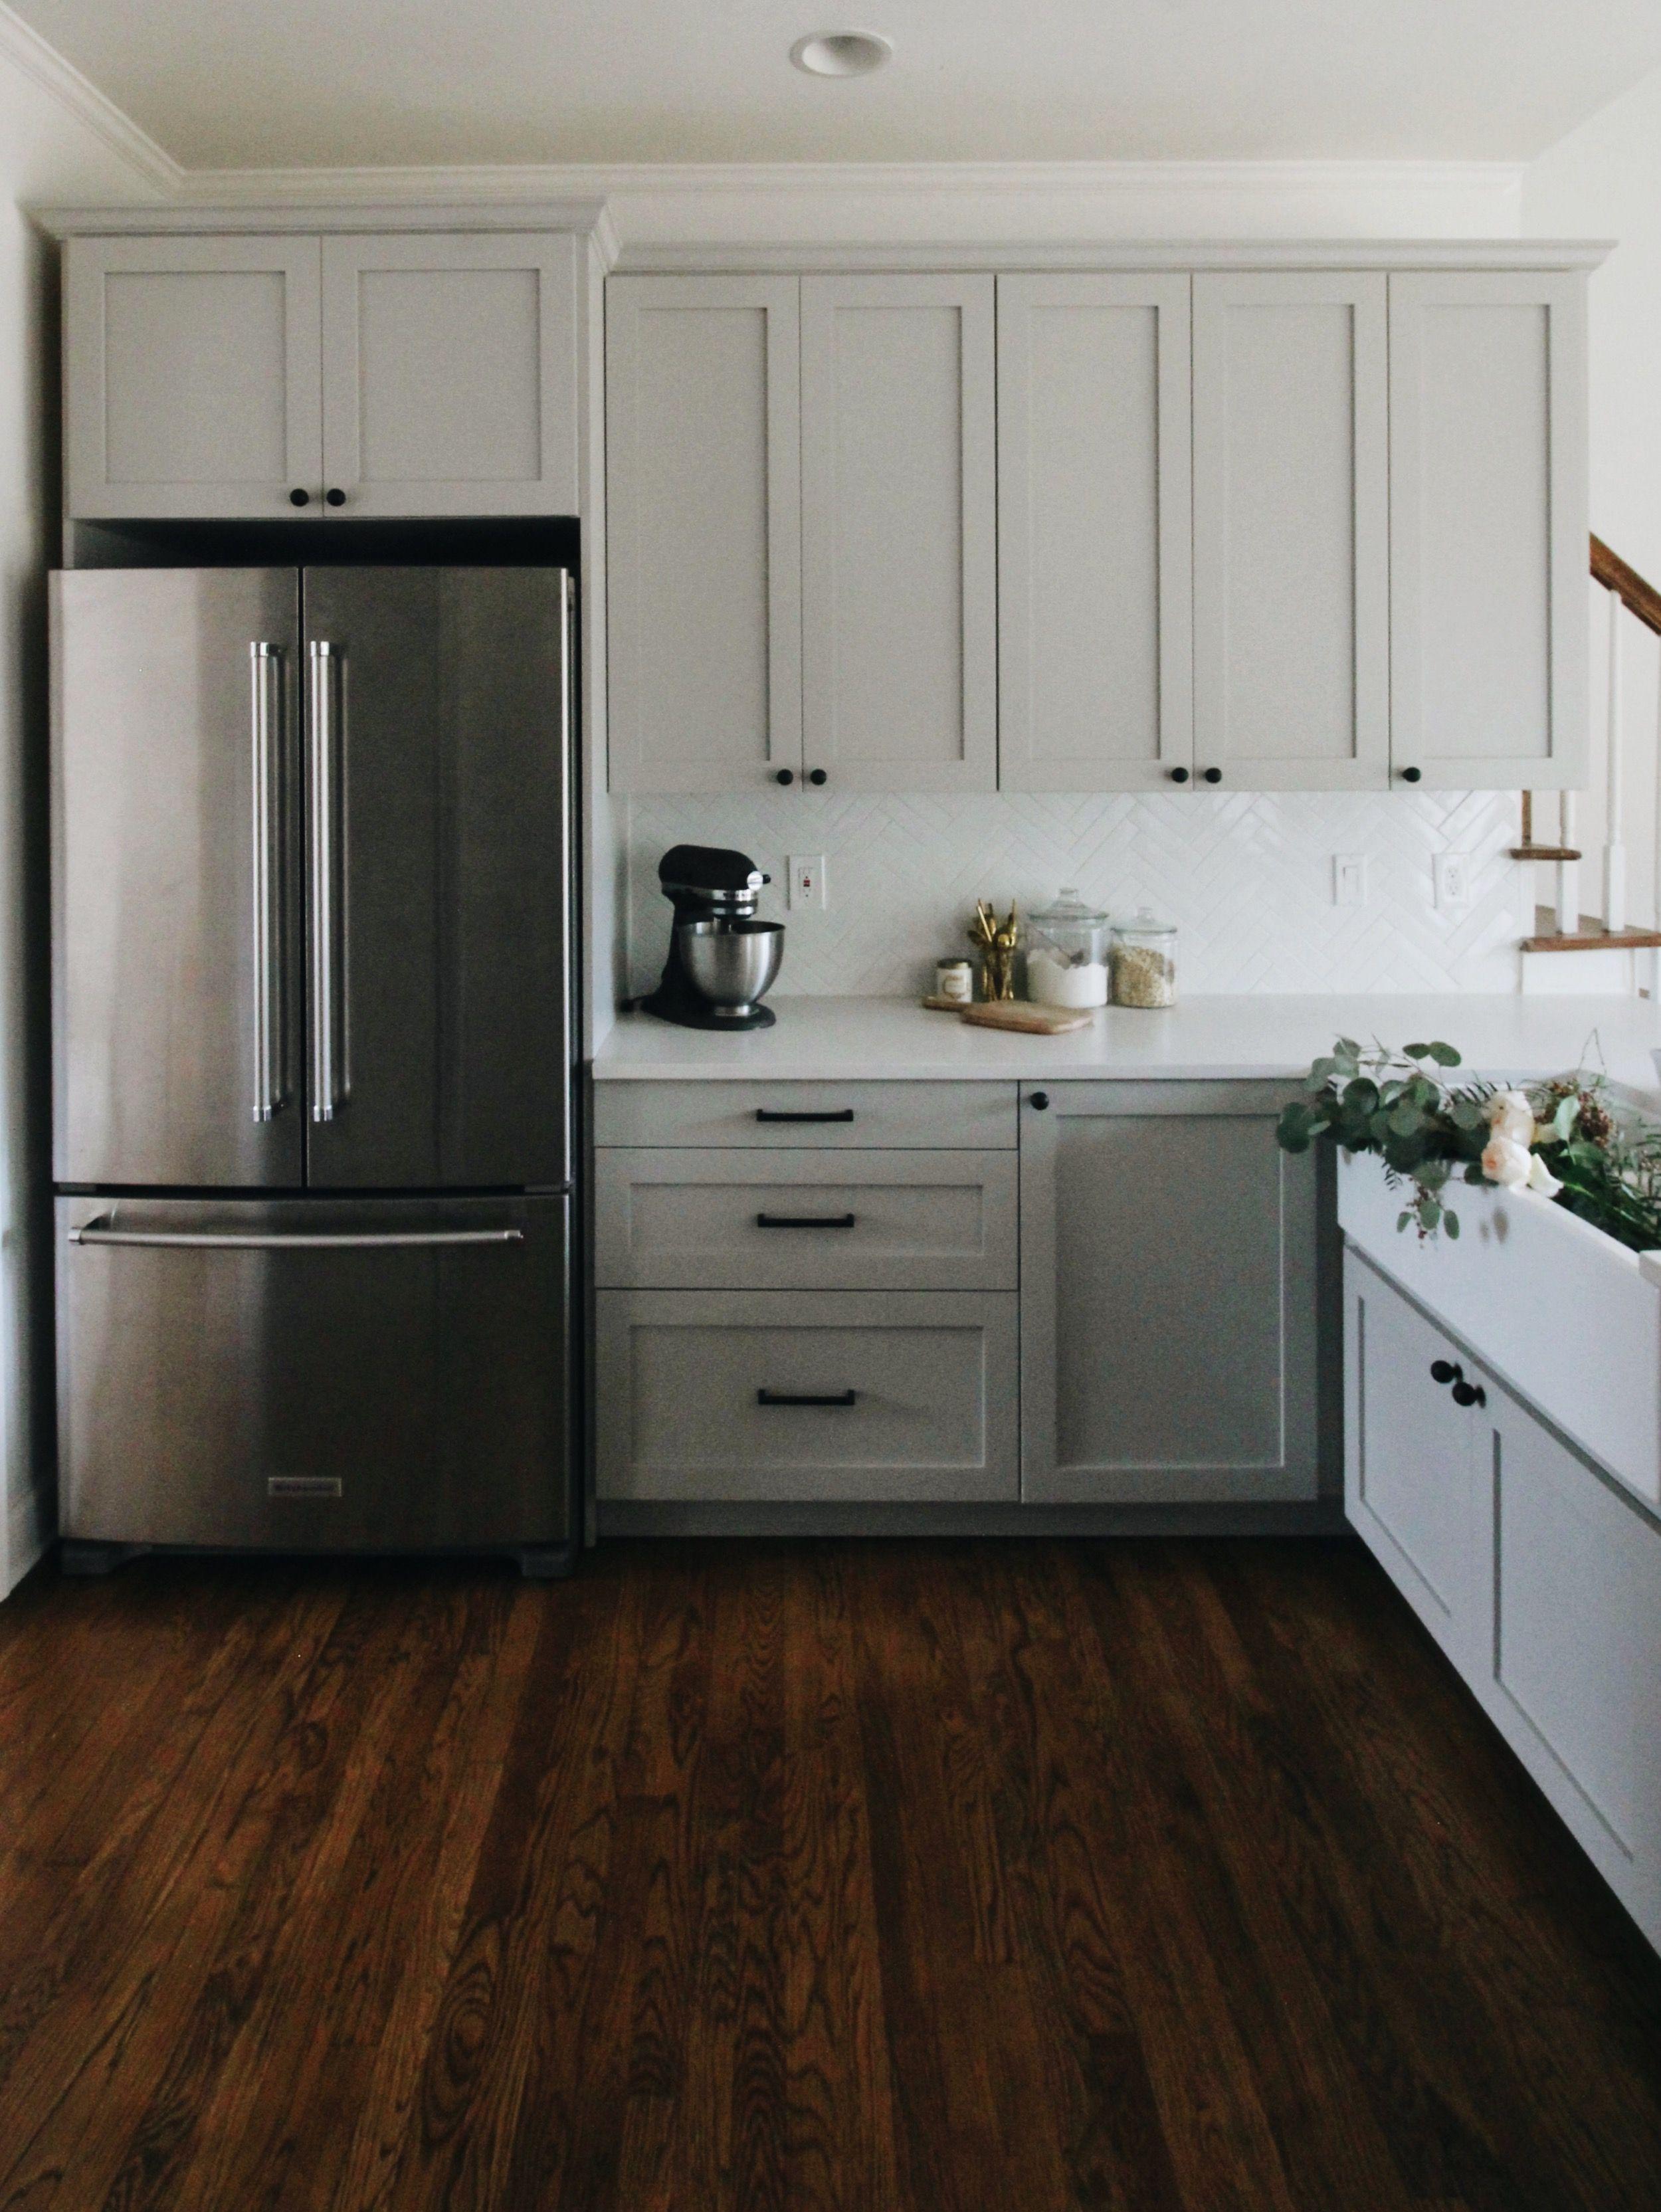 Ikea kitchen renovation garvin co cuisines placard angle cuisine cuisine ikea et - Cuisine moderne ikea ...